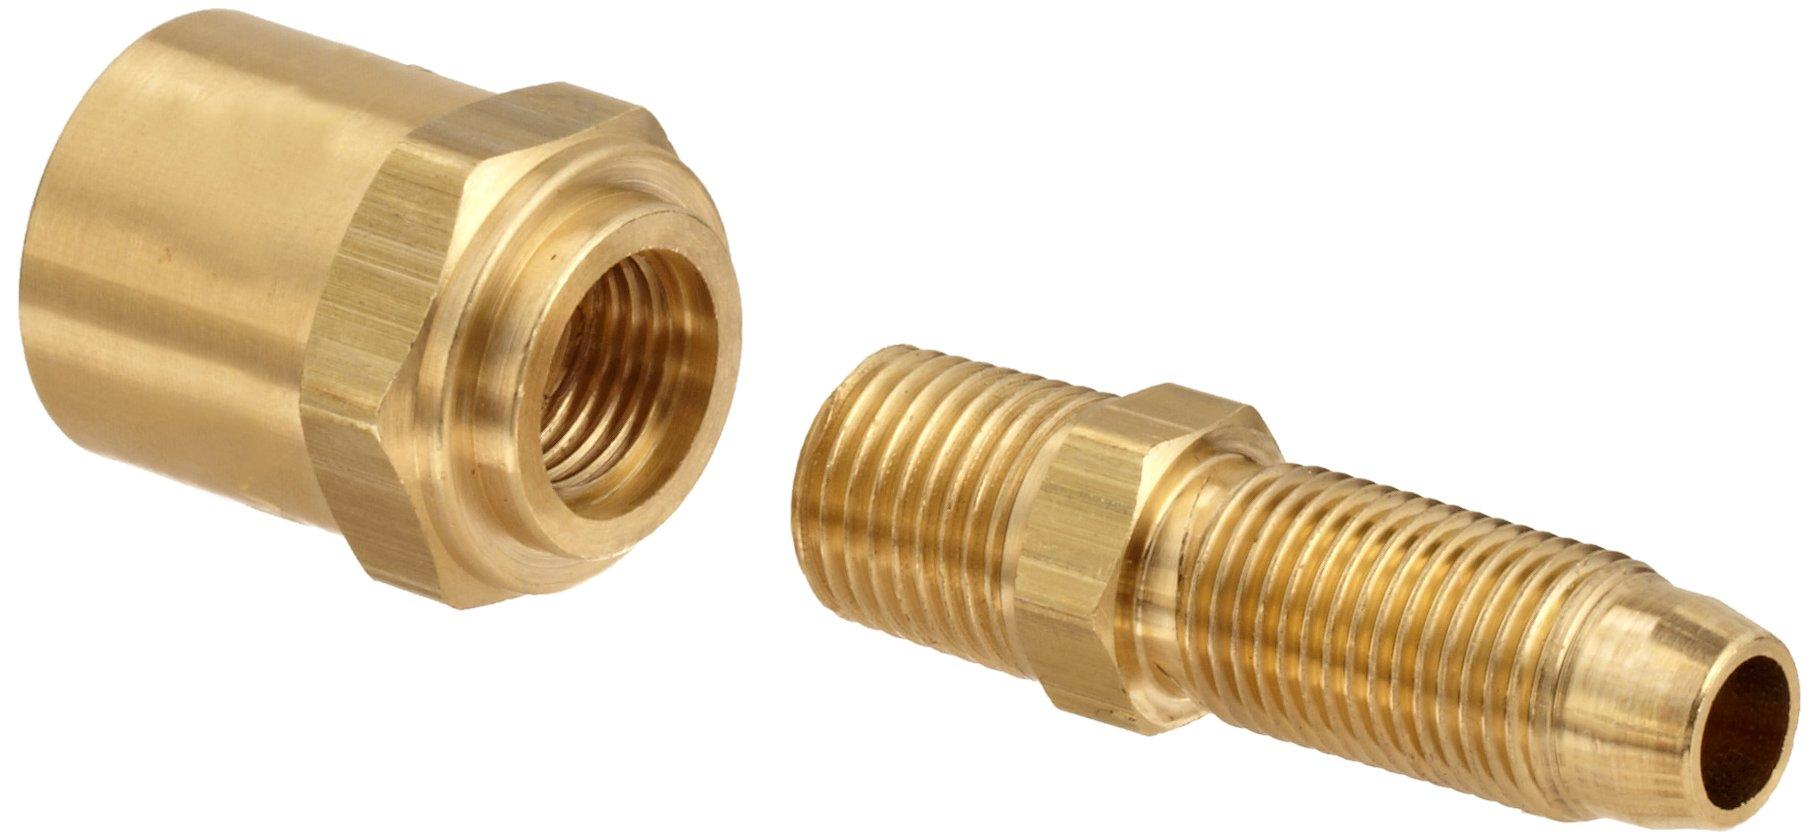 Dixon BN32RU68 Brass Reusable Fitting, Adapter, 1/4'' NPTF Male x 3/8'' Hose ID, 11/16'' Hose OD